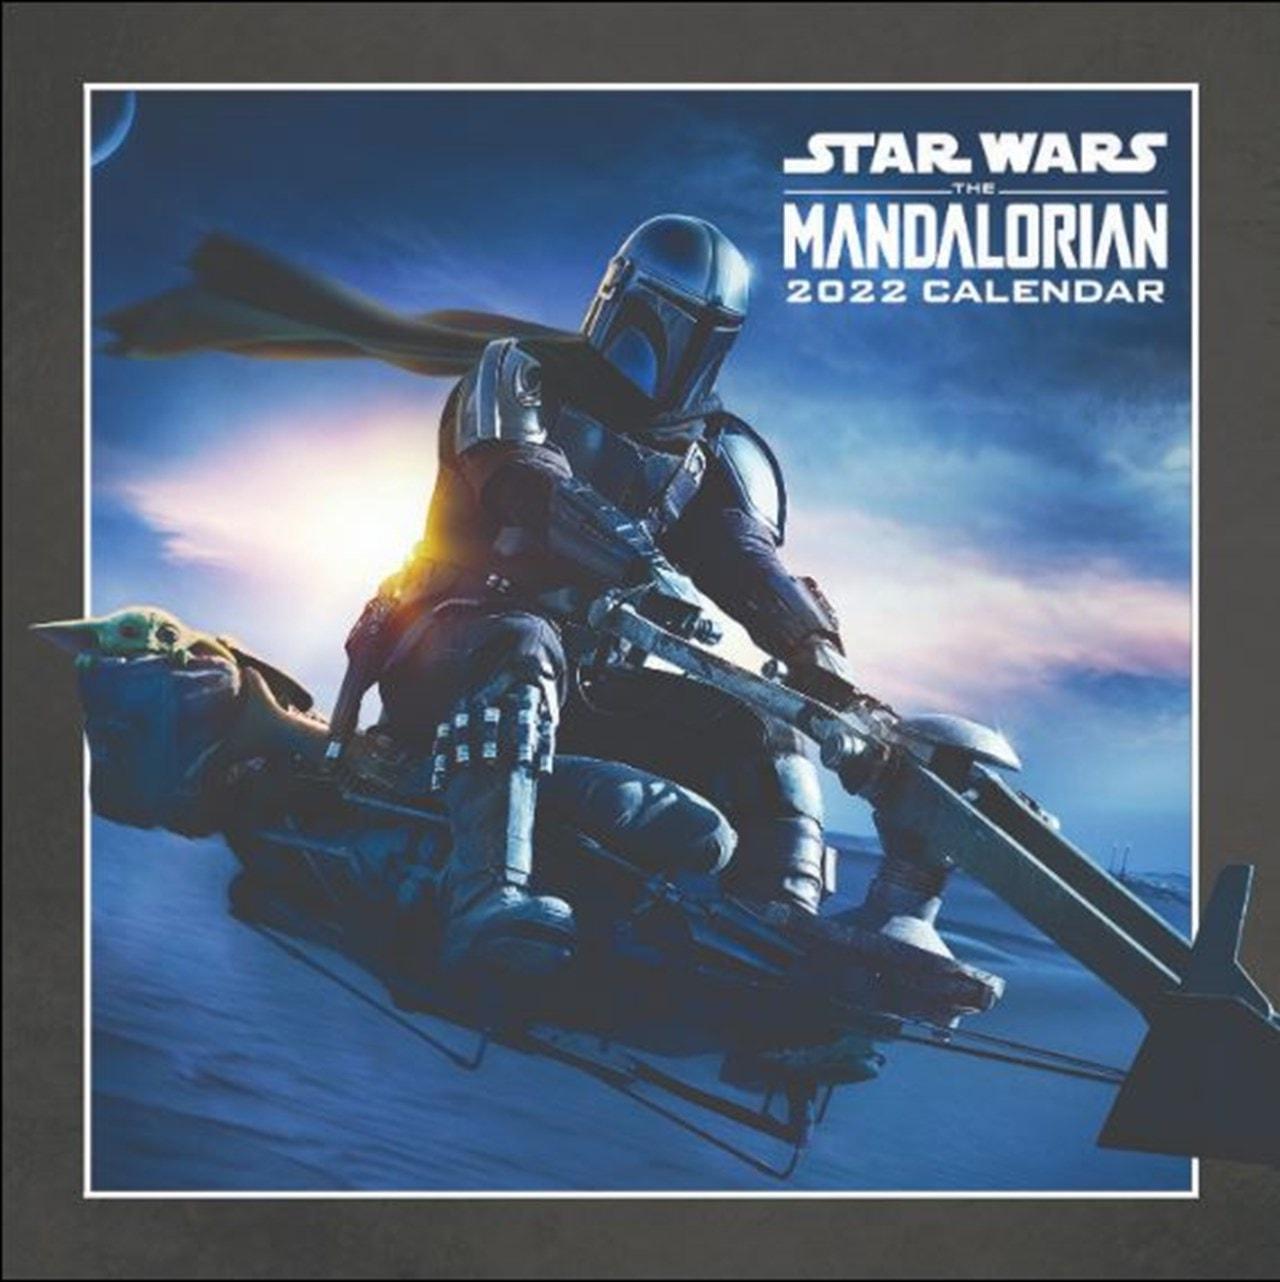 The Mandalorian: Star Wars: Square 2022 Calendar - 1